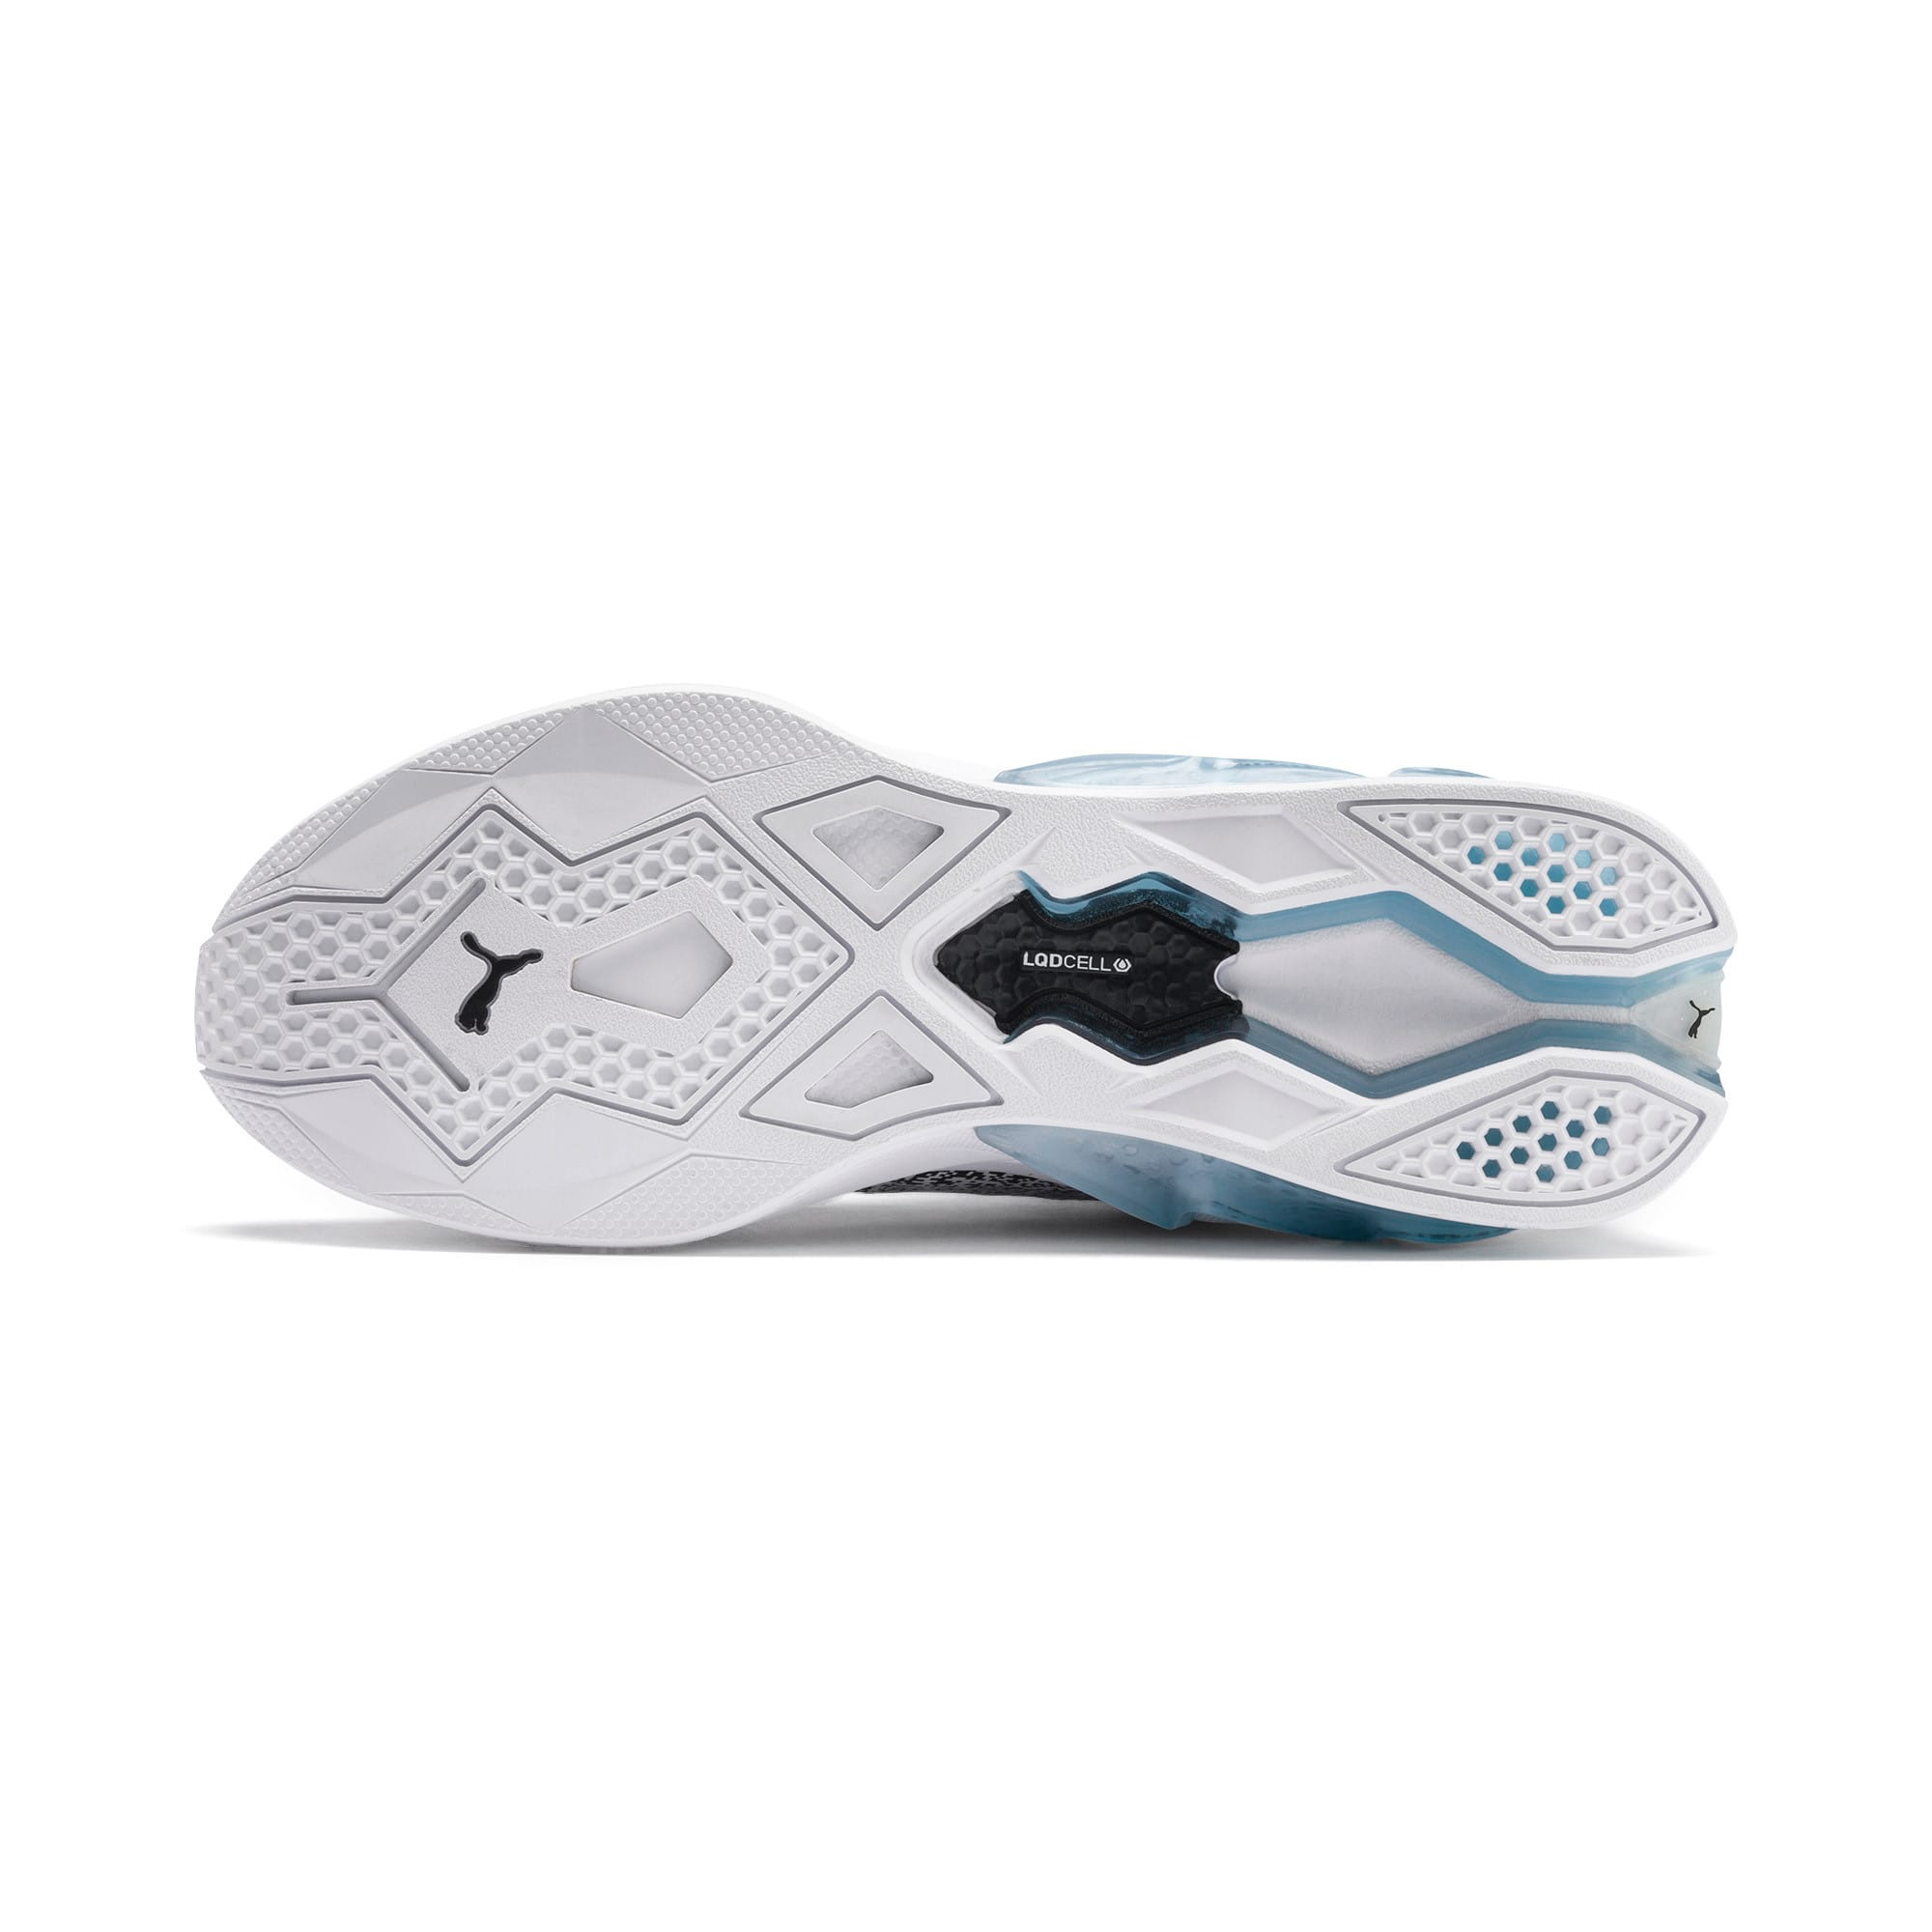 Thumbnail 4 of LQDCELL Origin AR Sneaker, Puma White-Puma Black, medium